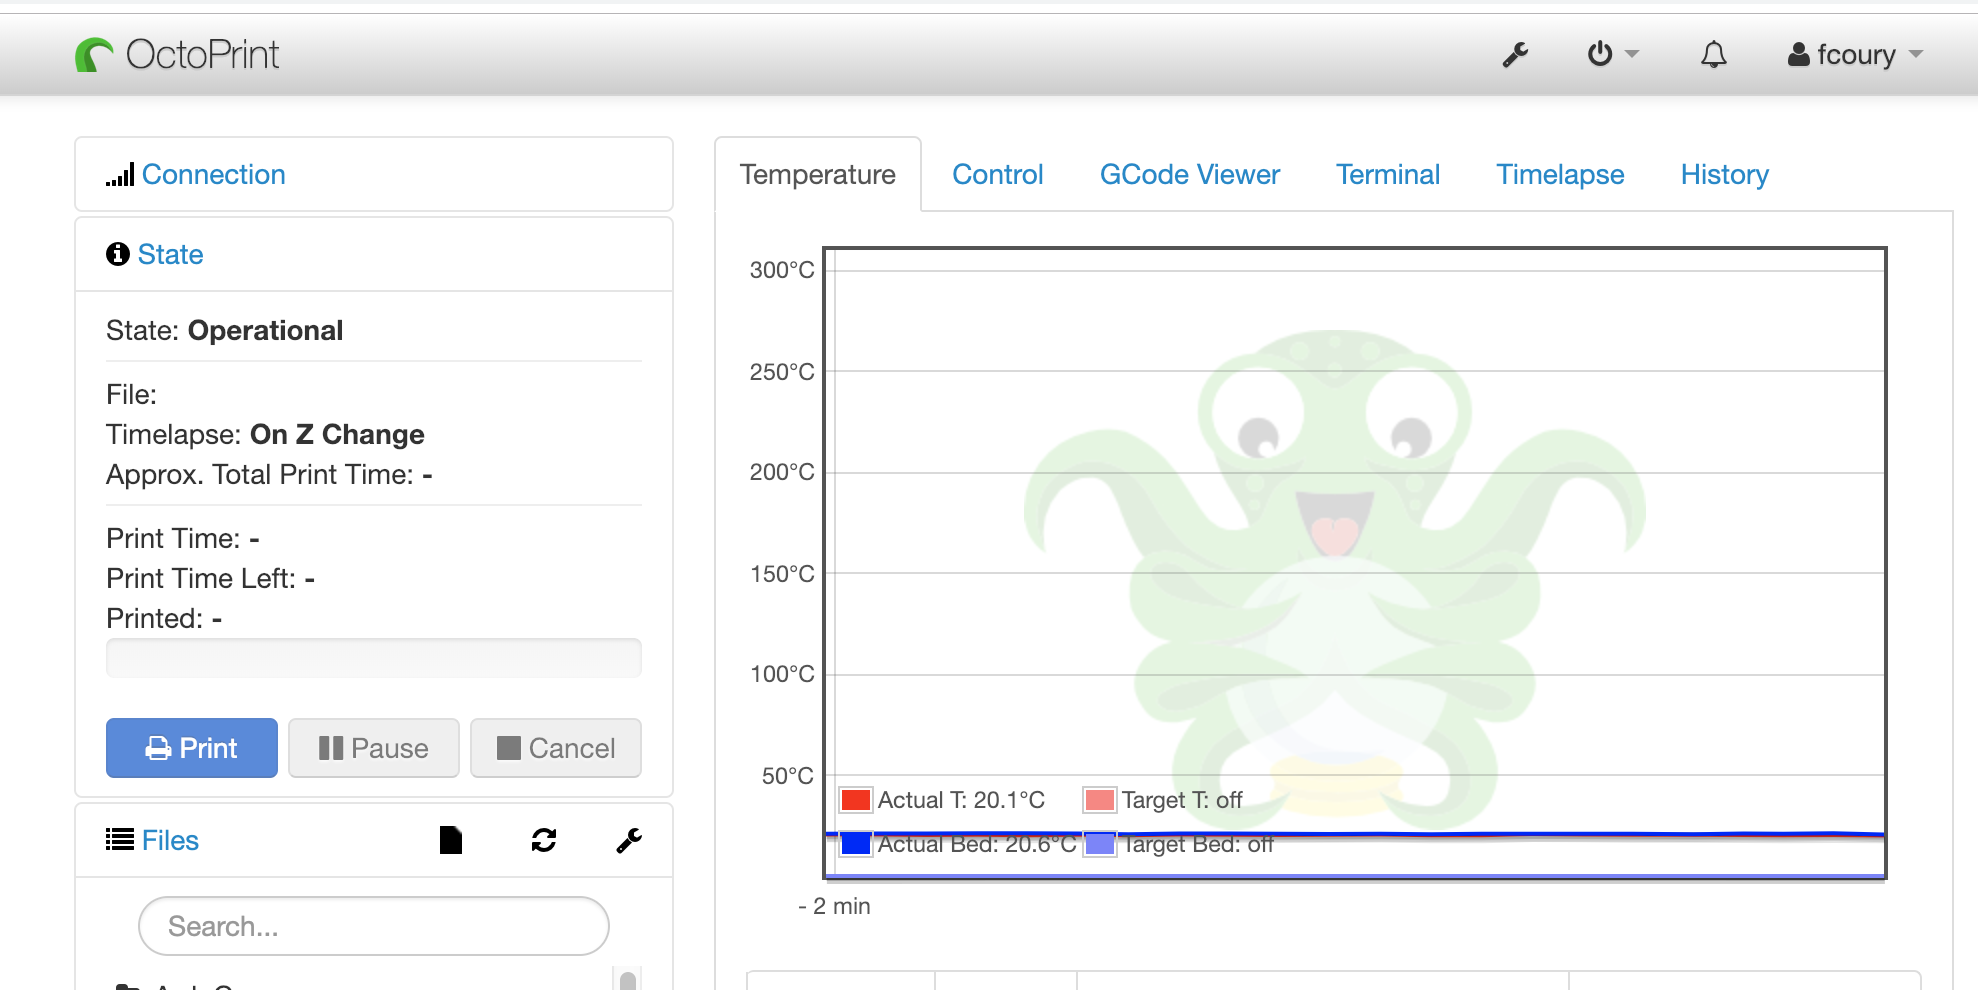 Octoprint server won't start after upgrade to 1 3 10 - Get